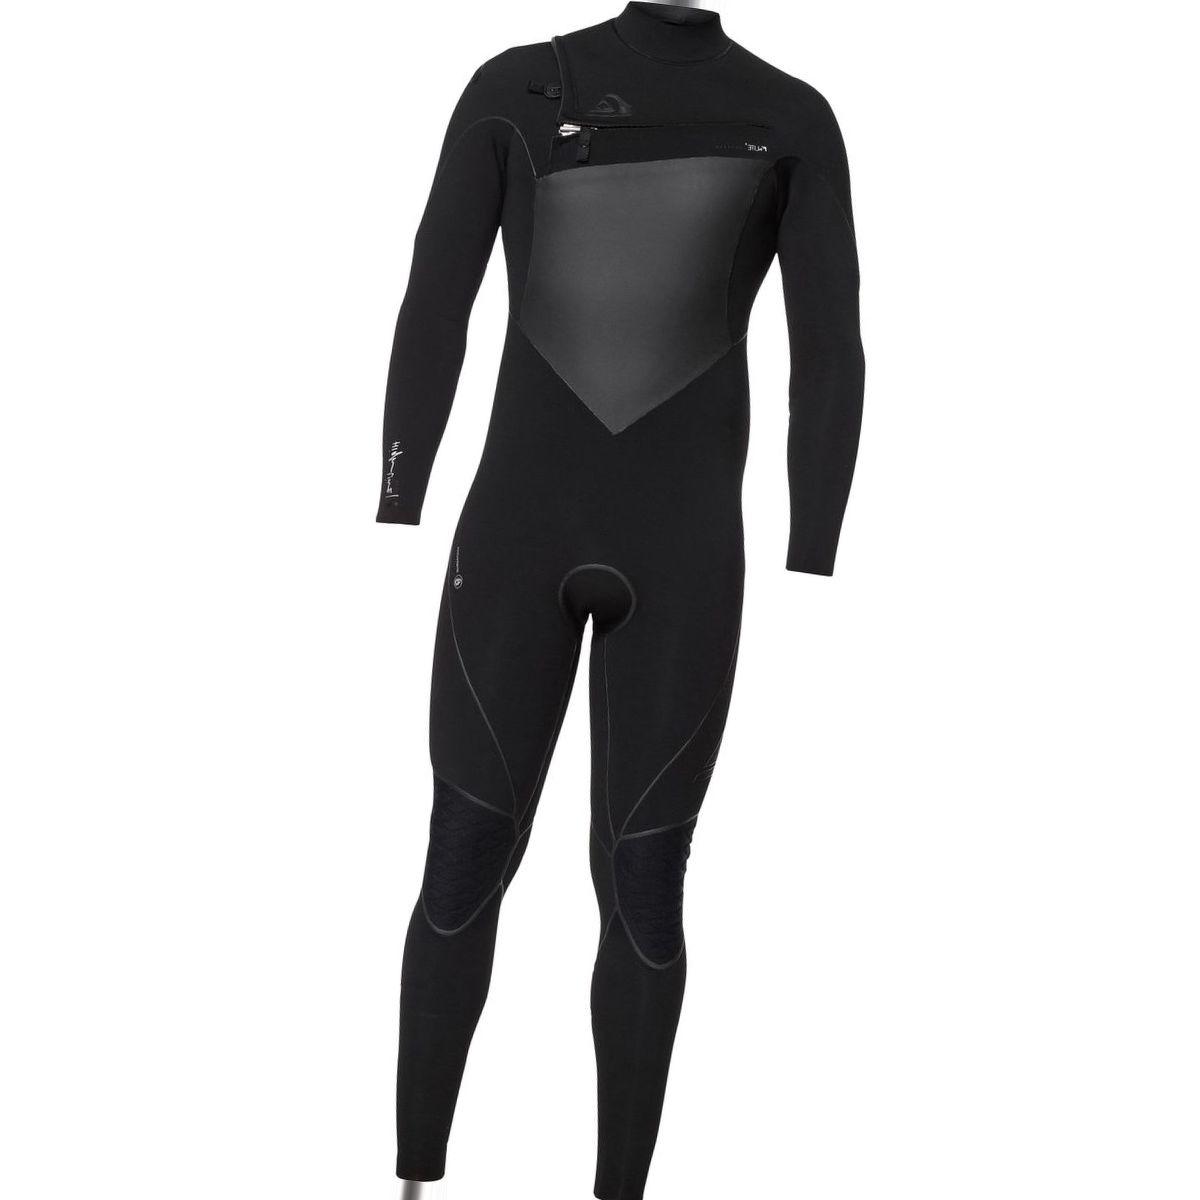 Quiksilver 3/2 Highline Plus Chest-Zip Hydrolock Wetsuit - Men's